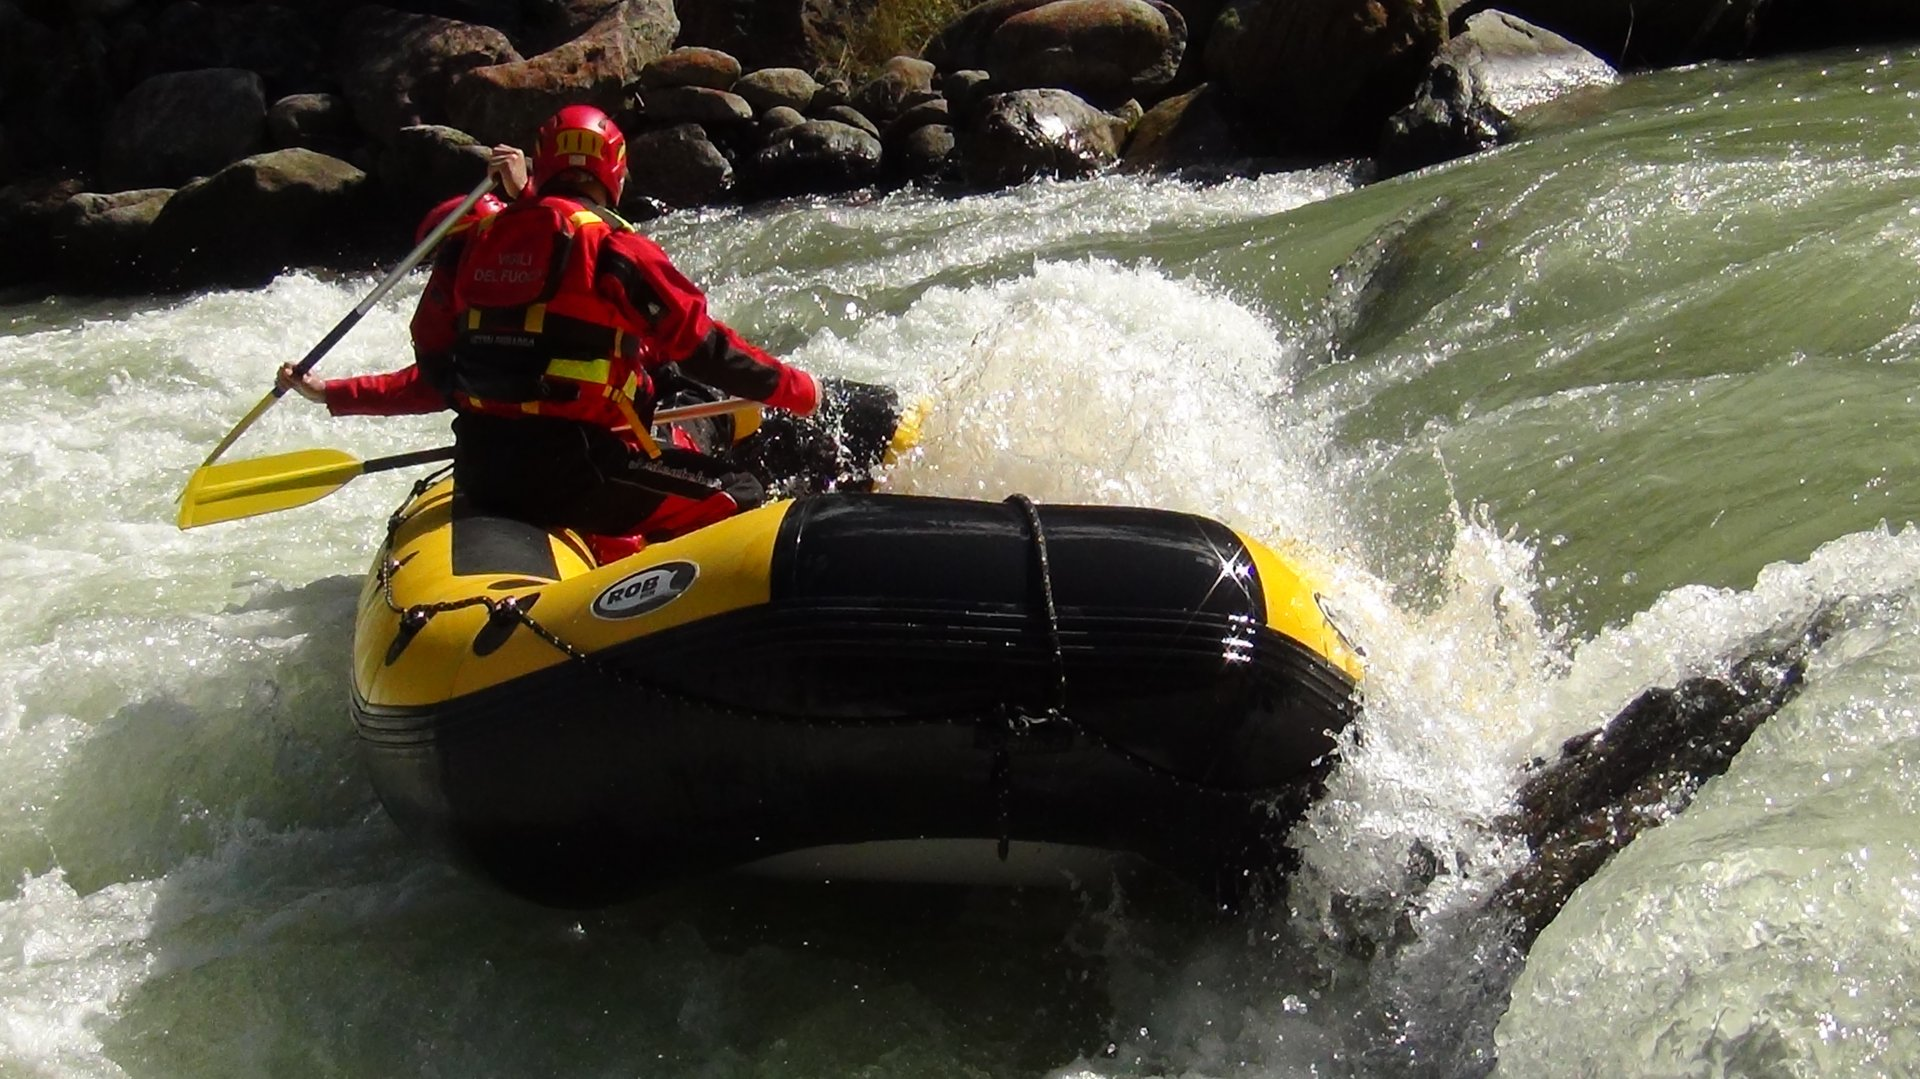 Training course perfezionamento raft